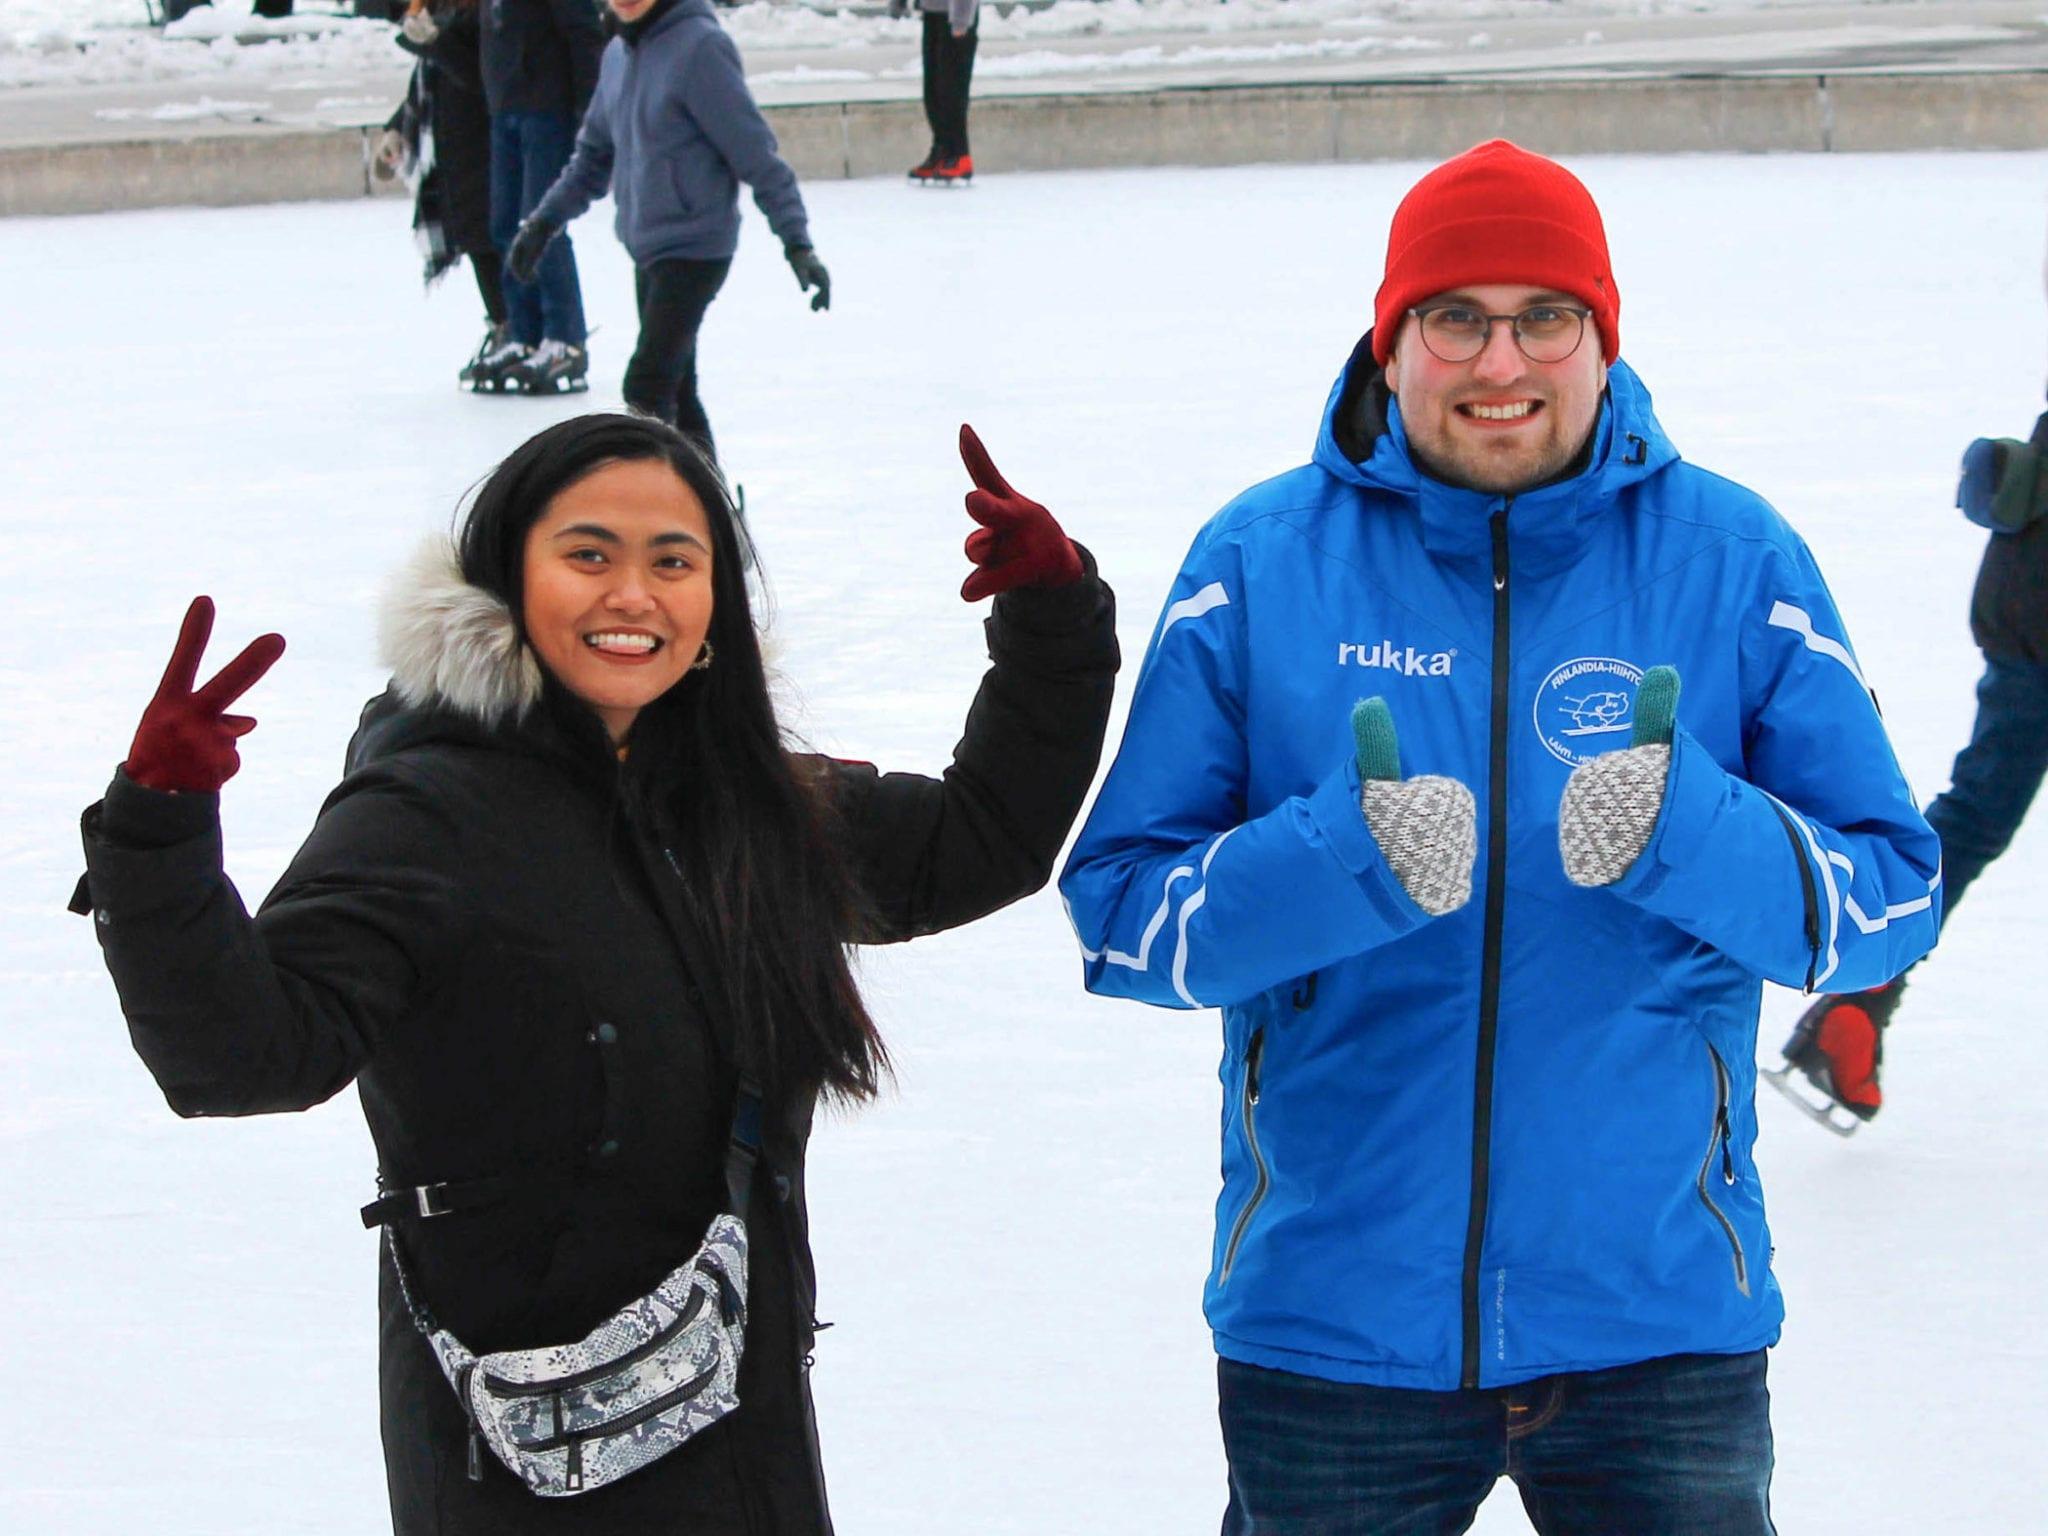 Two people skating